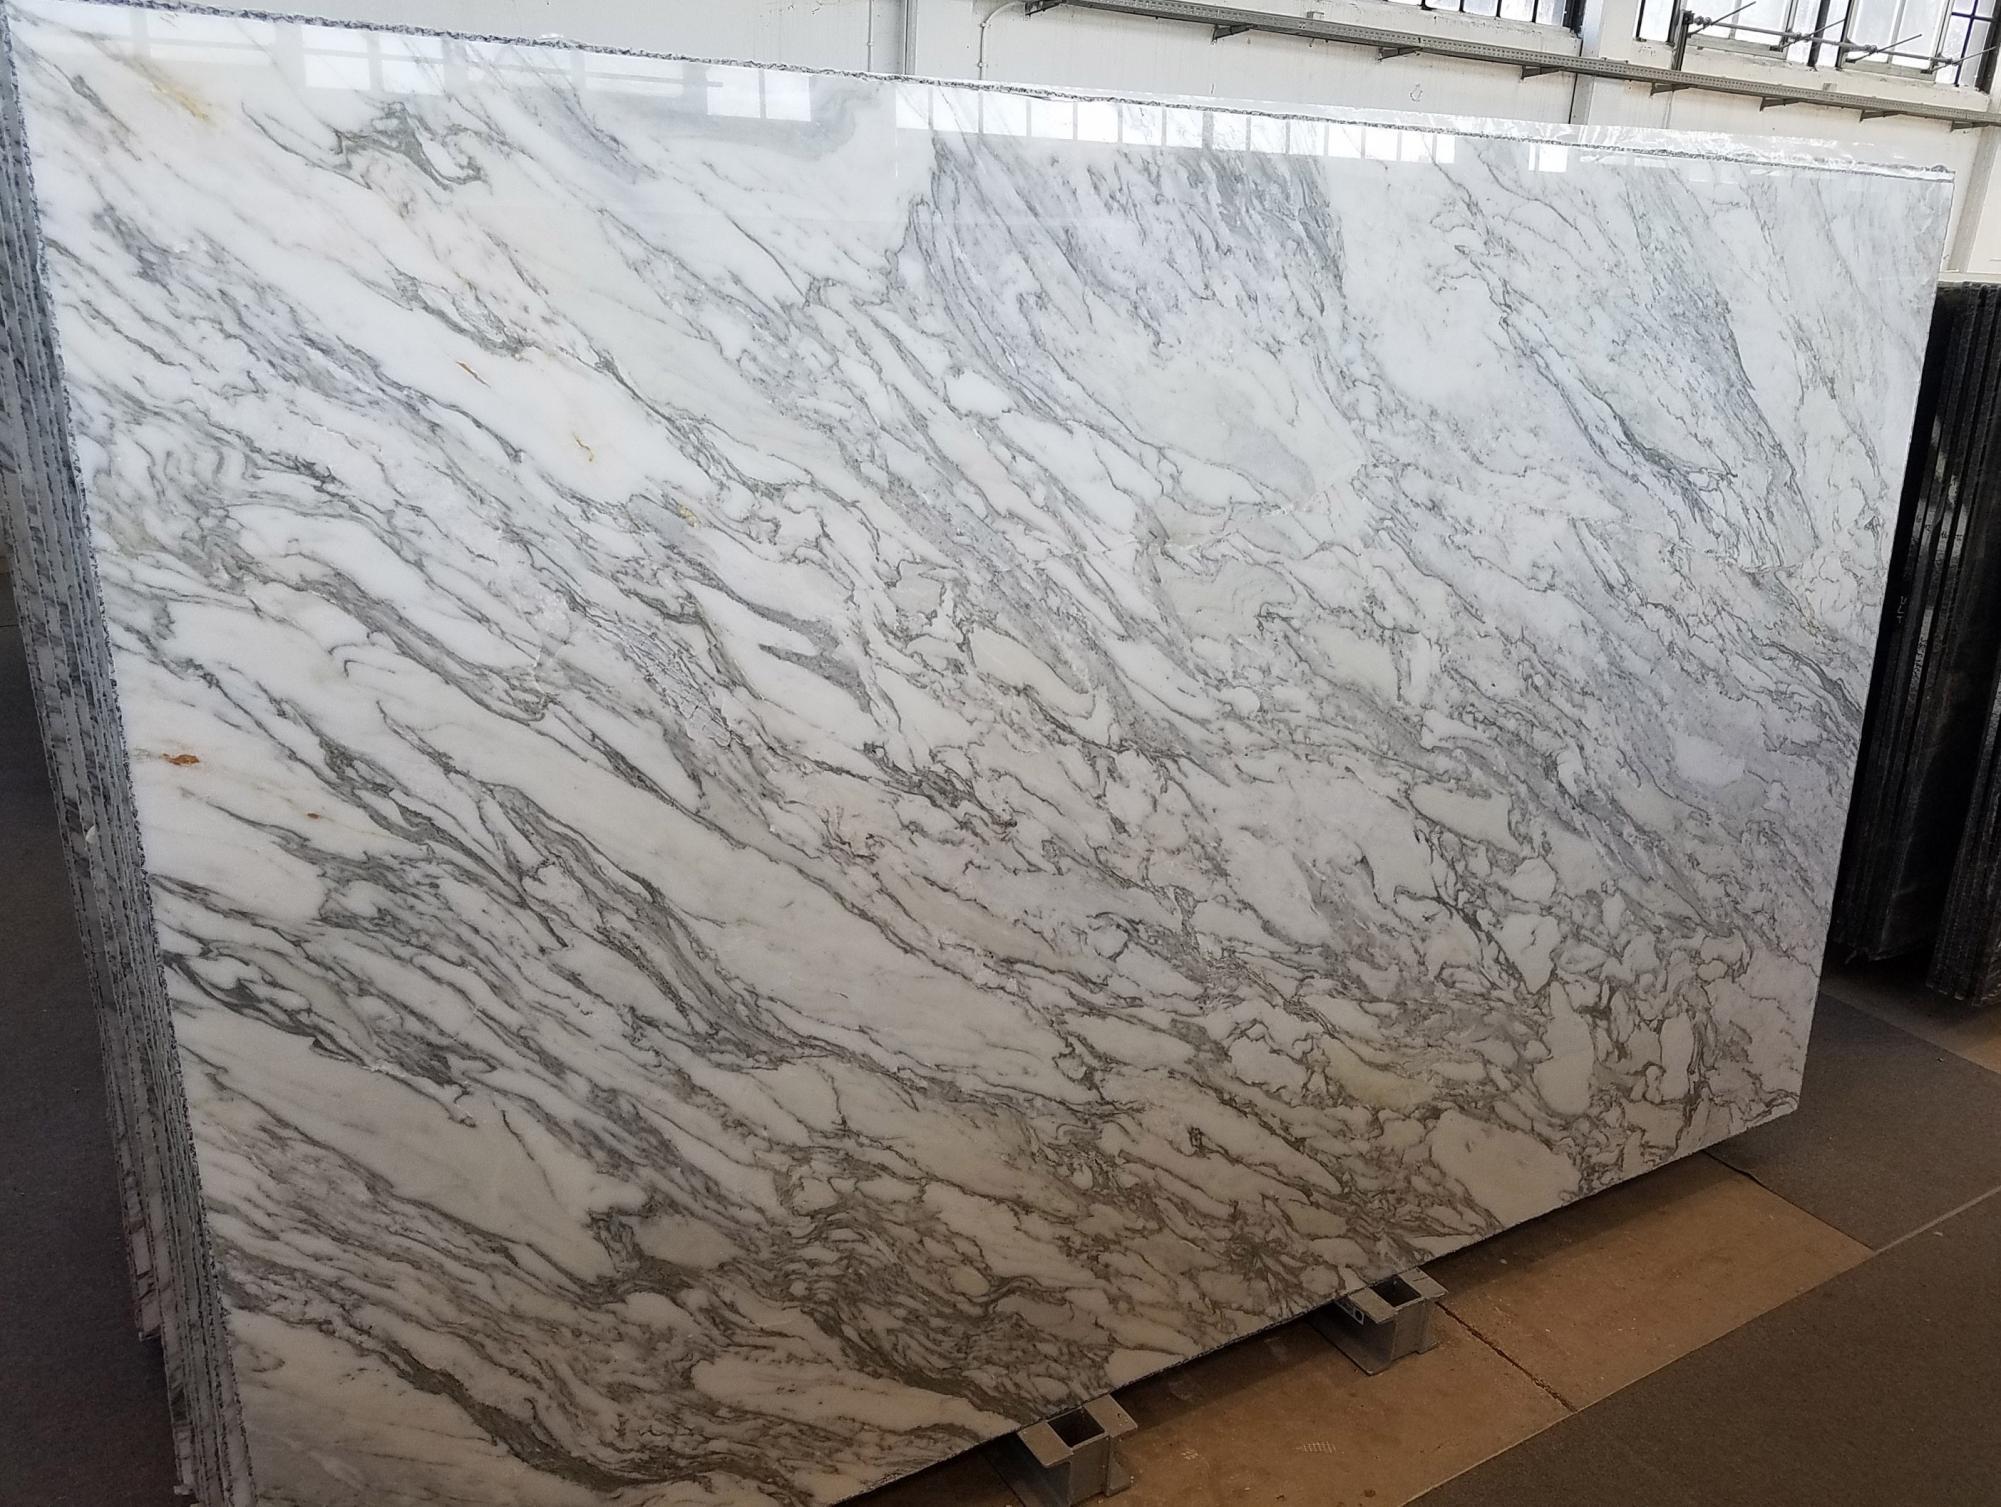 CALACATTA ARNI Suministro Veneto (Italia) de planchas pulidas en mármol natural Z0182 , Slab #01